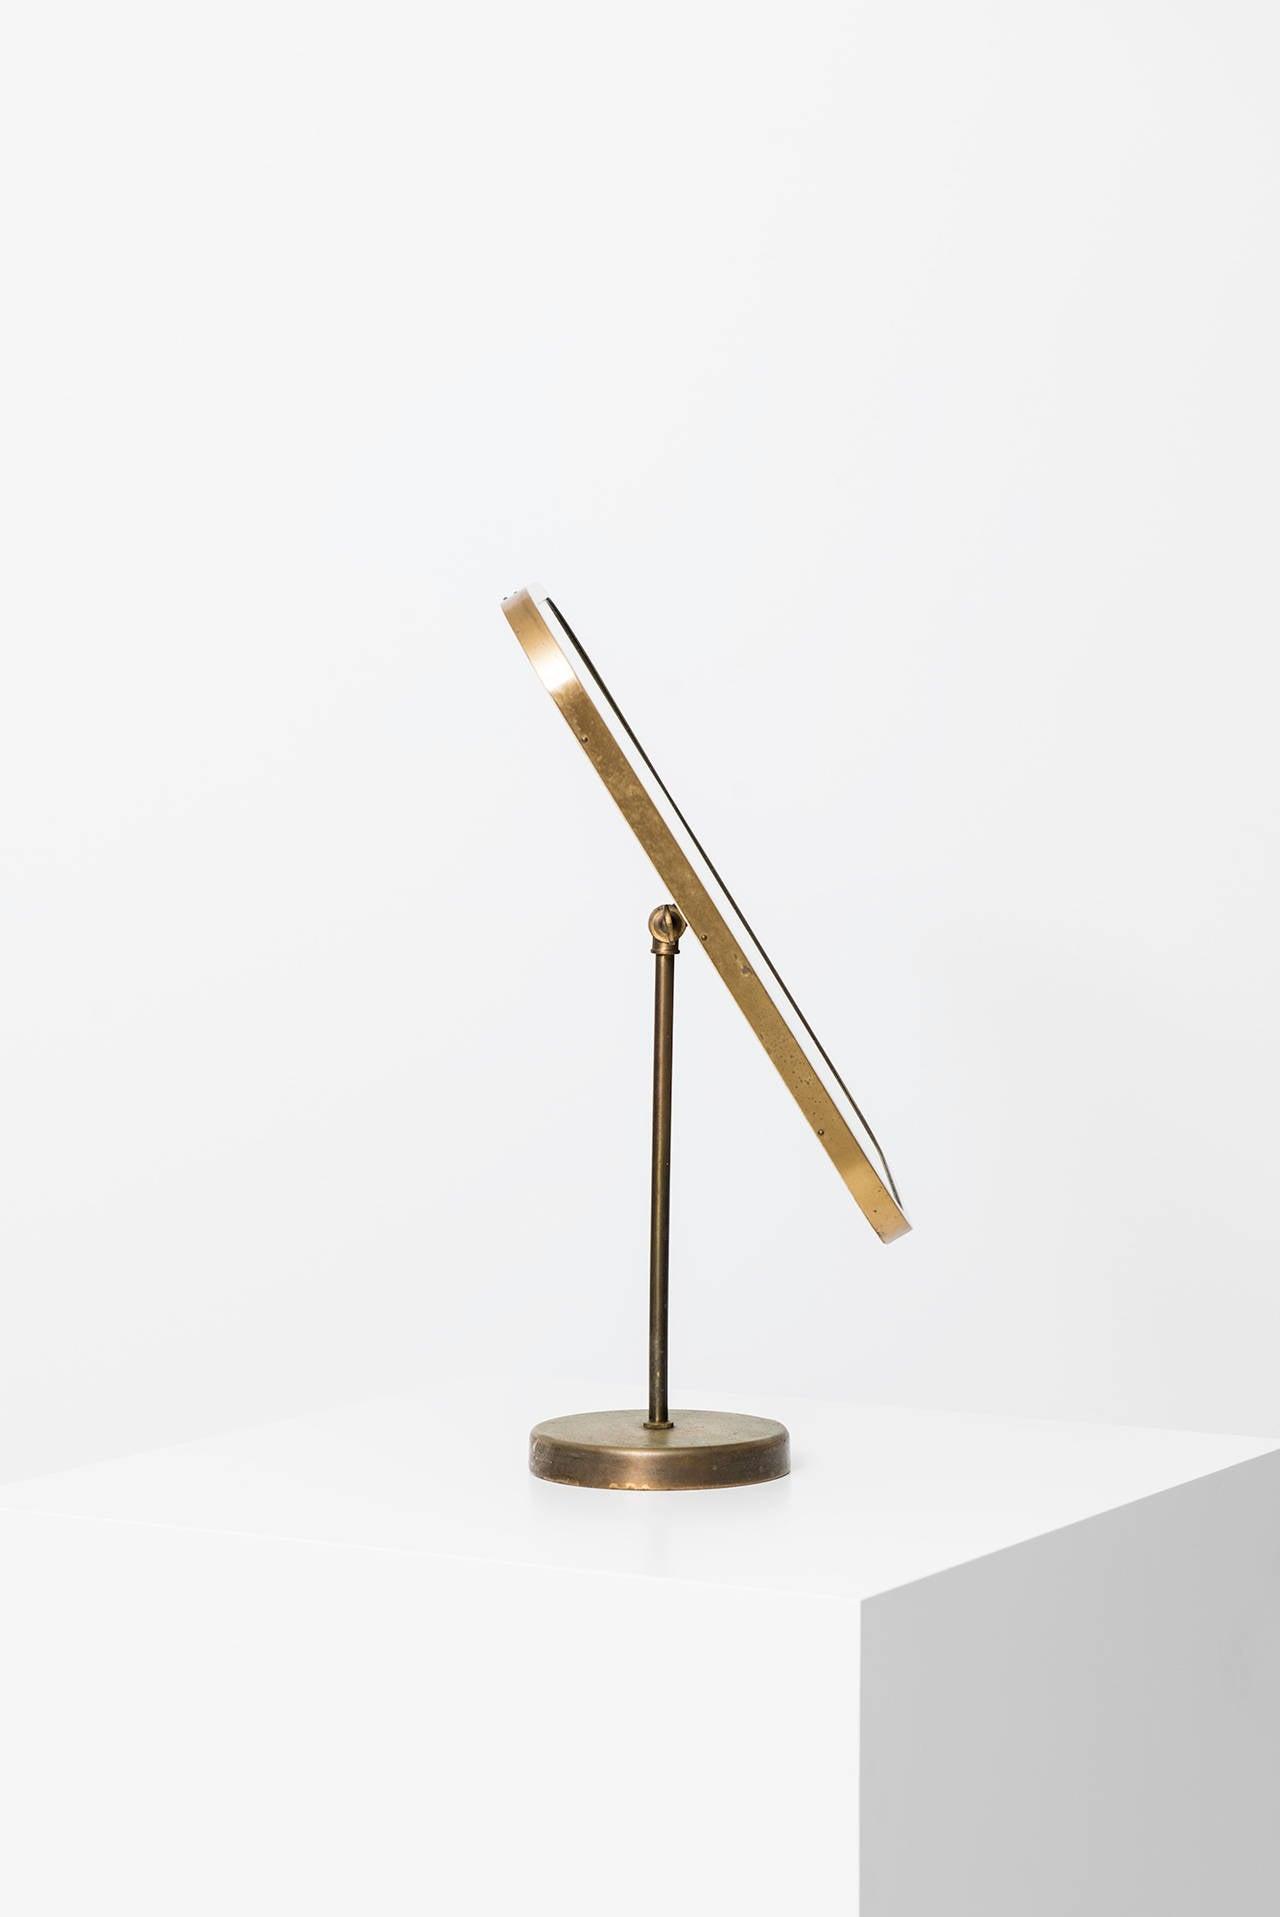 Mid-Century Modern Josef Frank Table Mirror in Brass by Nordiska Kompaniet in Sweden For Sale